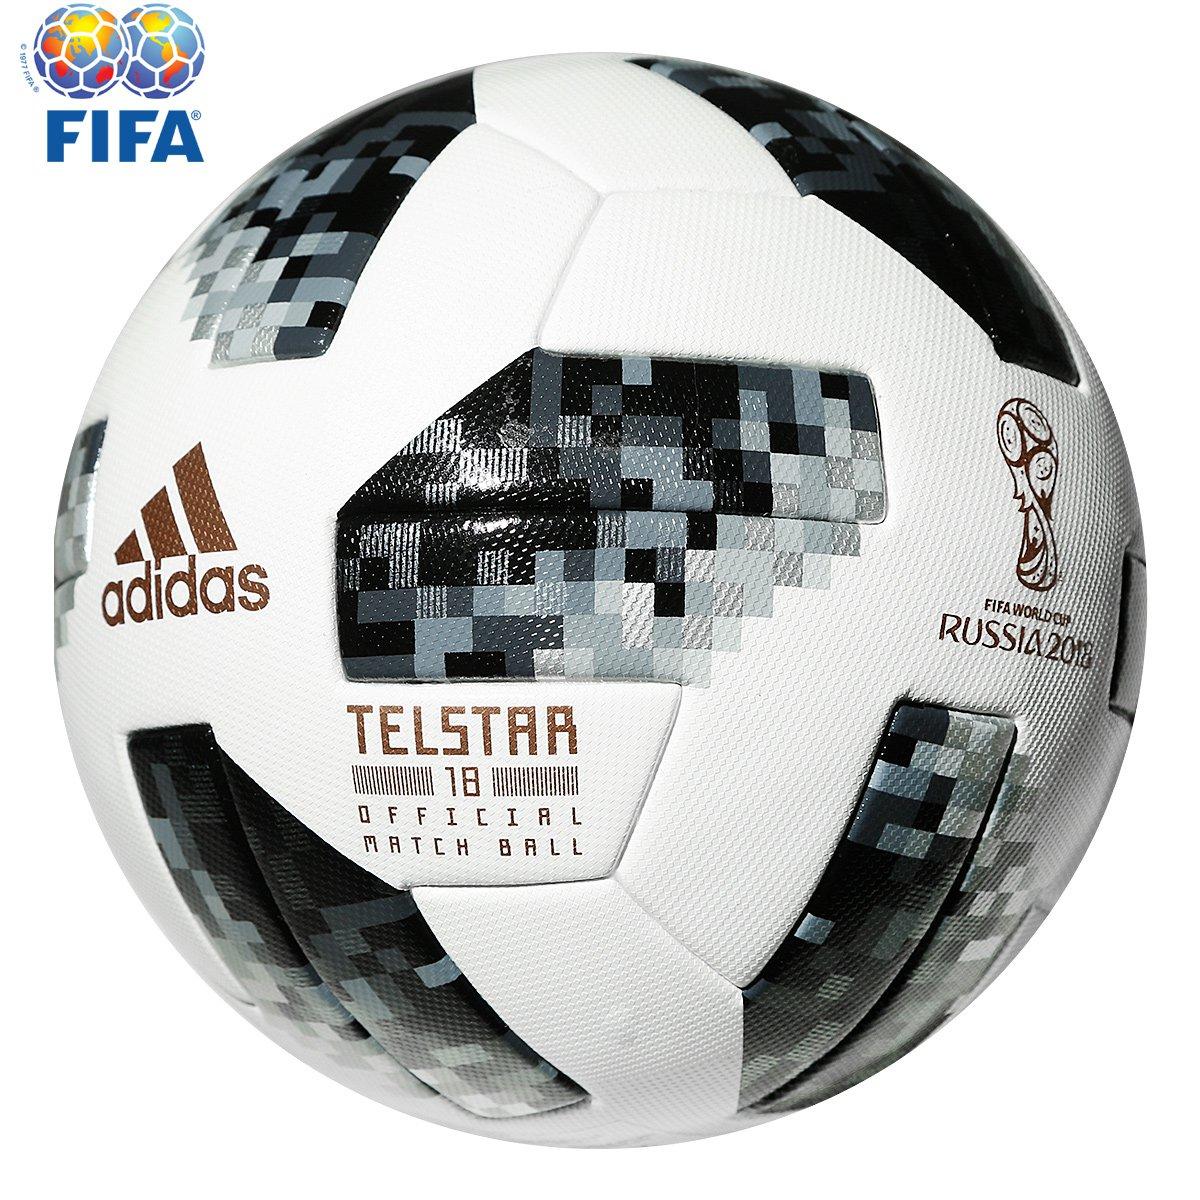 4eb21f5240f5b Bola Futebol Campo Adidas Telstar 18 OMB Copa do Mundo FIFA - Compre Agora